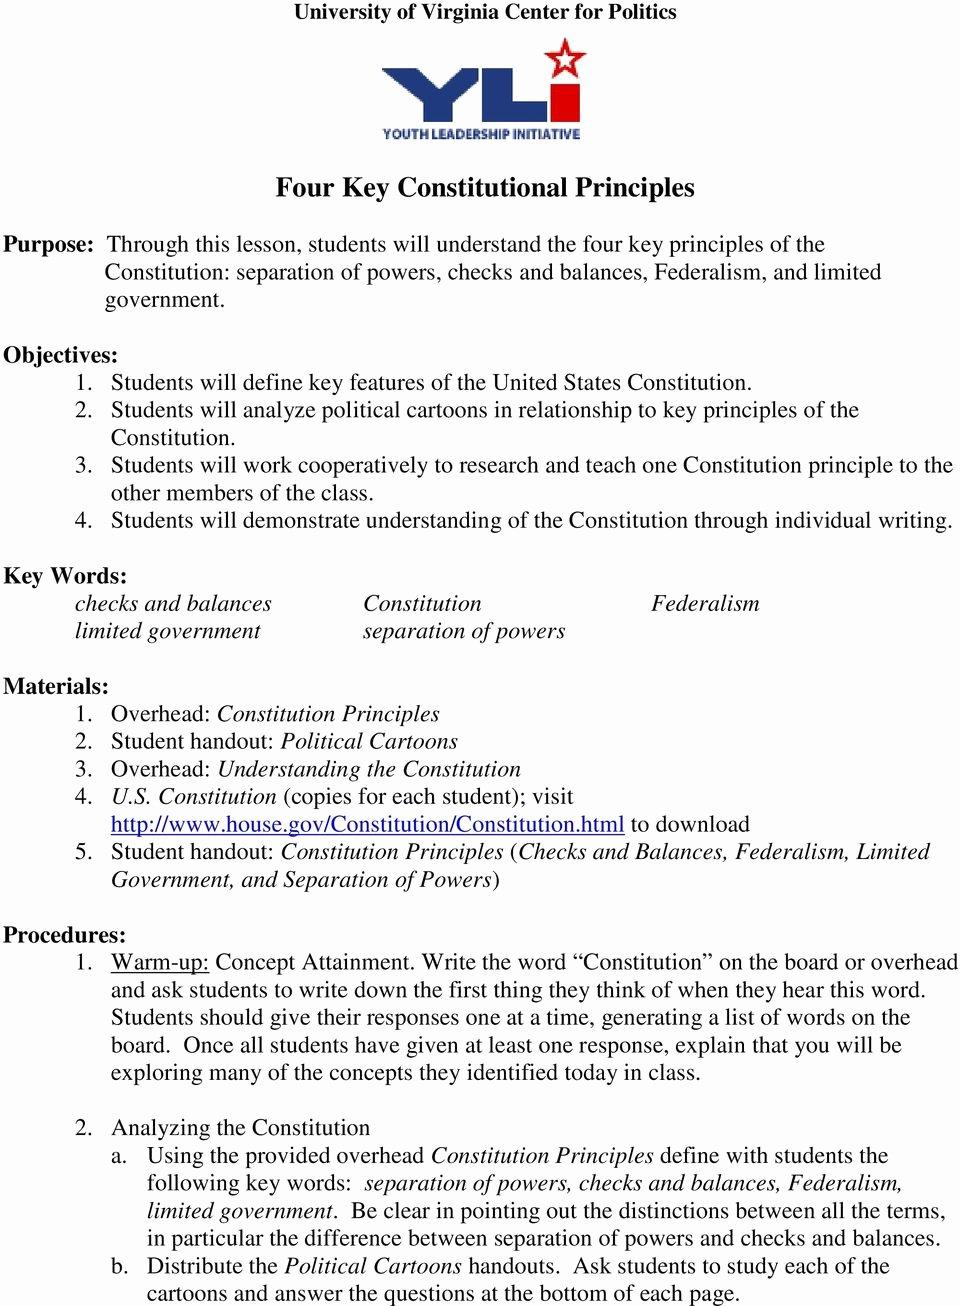 Constitutional Principles Worksheet Answers Luxury Worksheet Separation Powers Worksheet Worksheet Fun